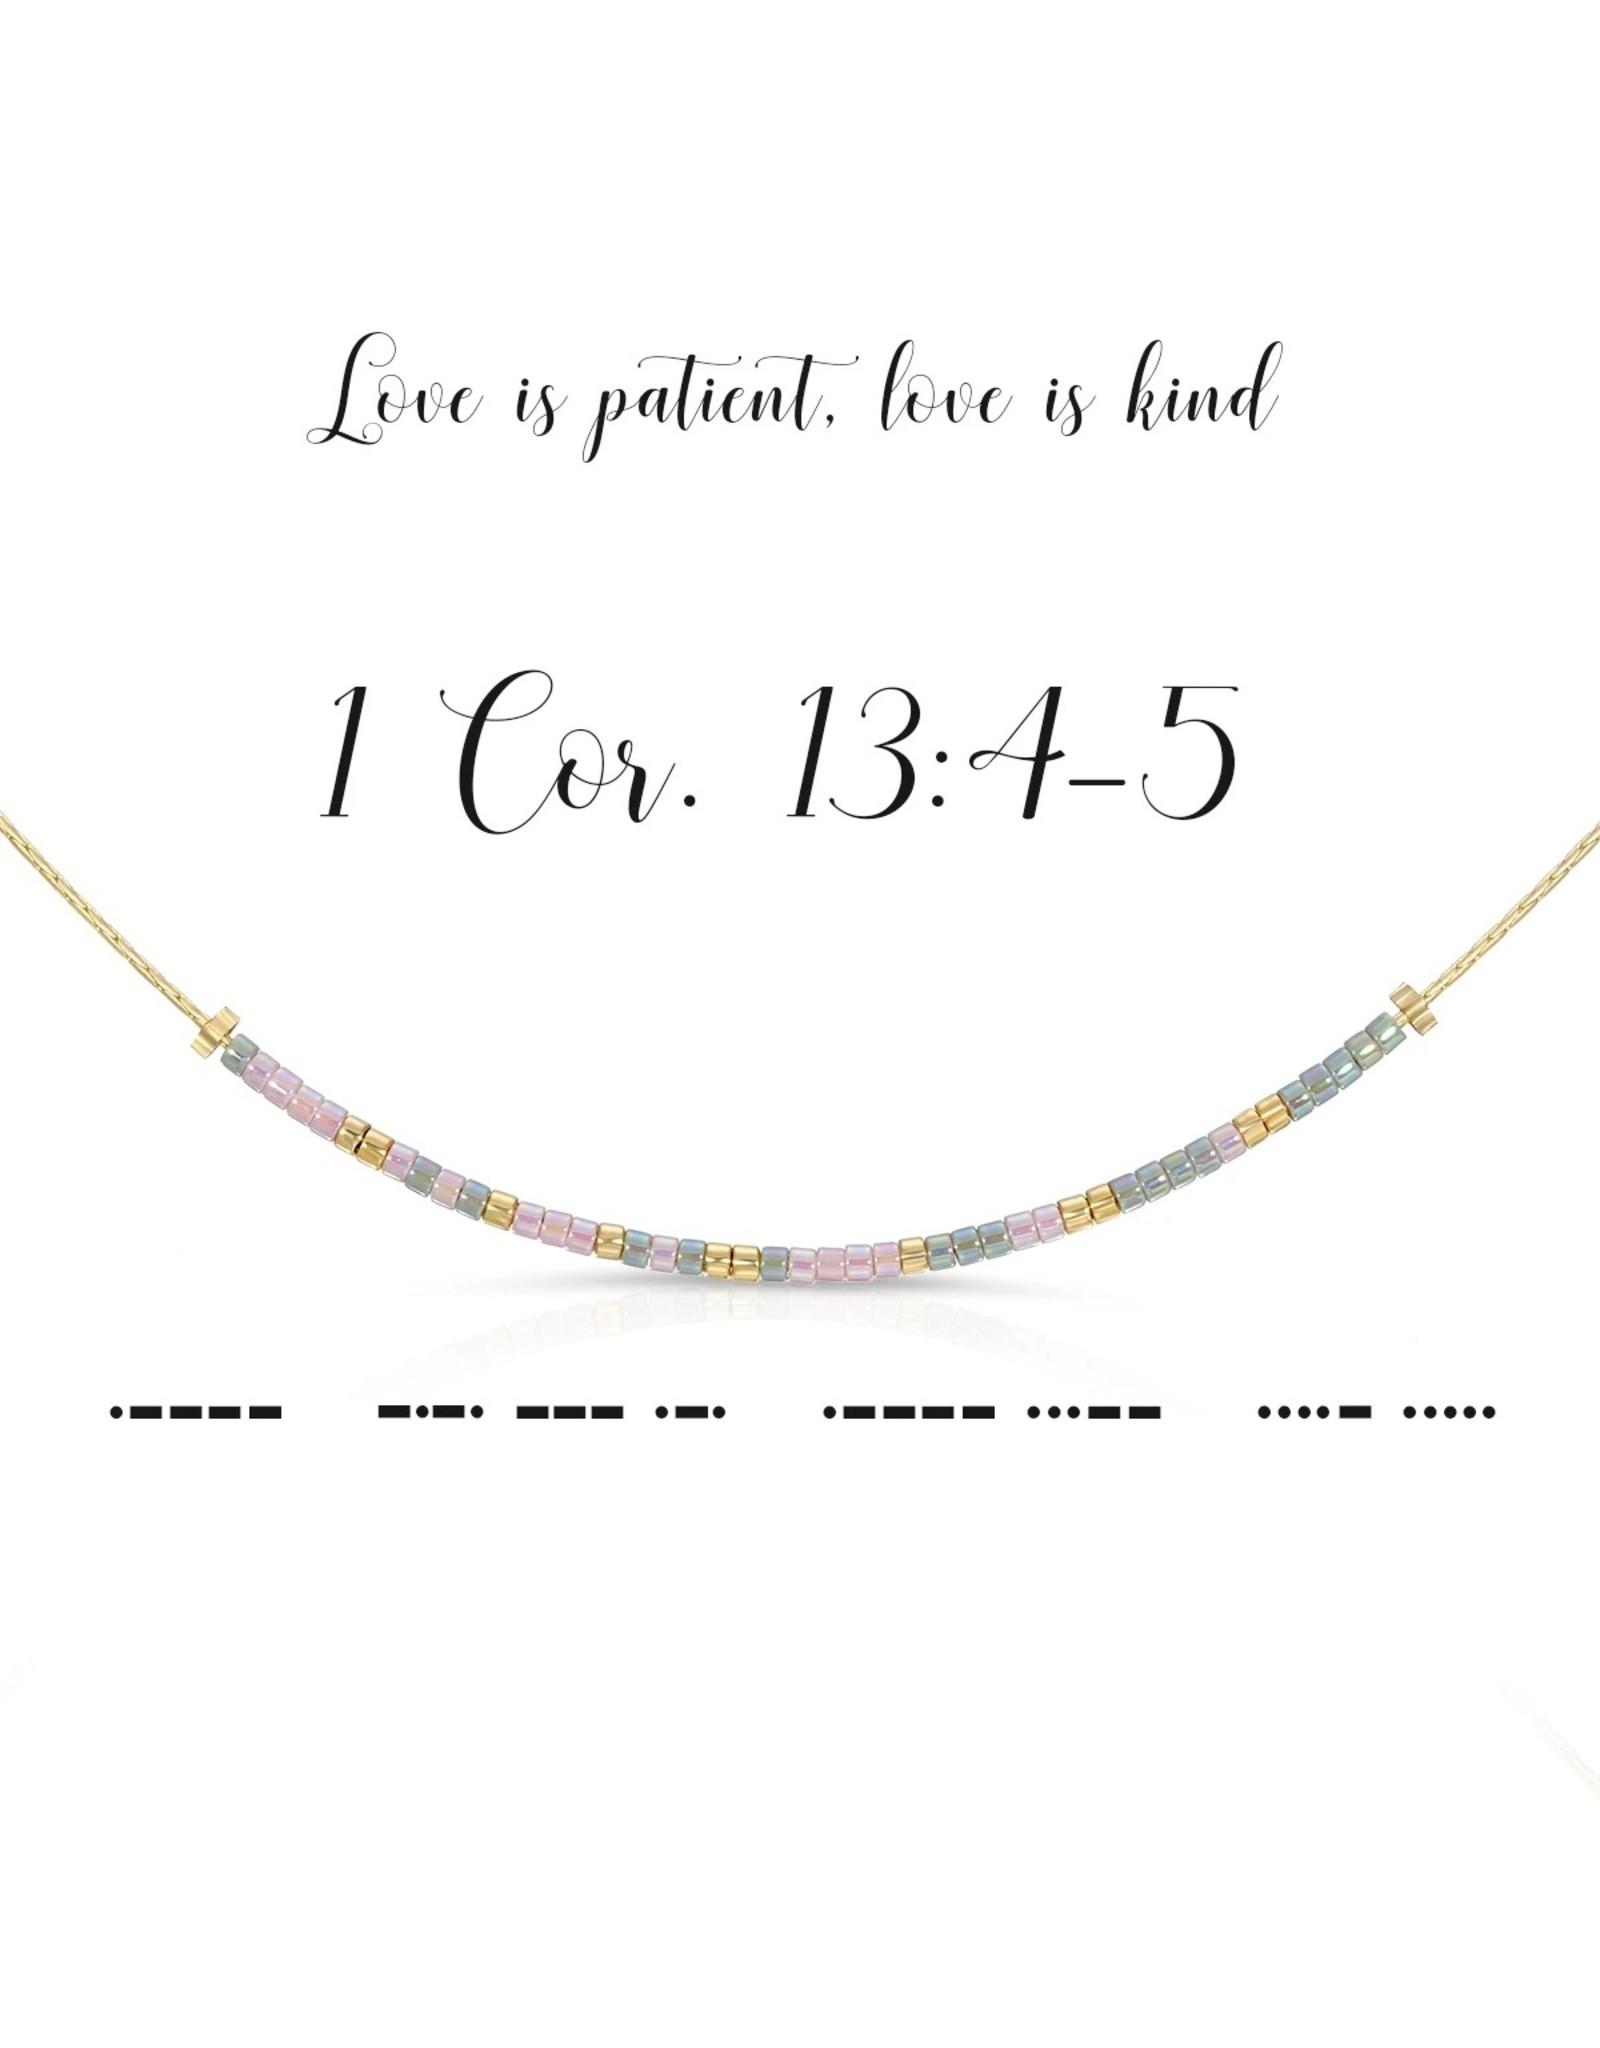 Dot And Dash Designs 1 Cor. 13:4-5 Necklace